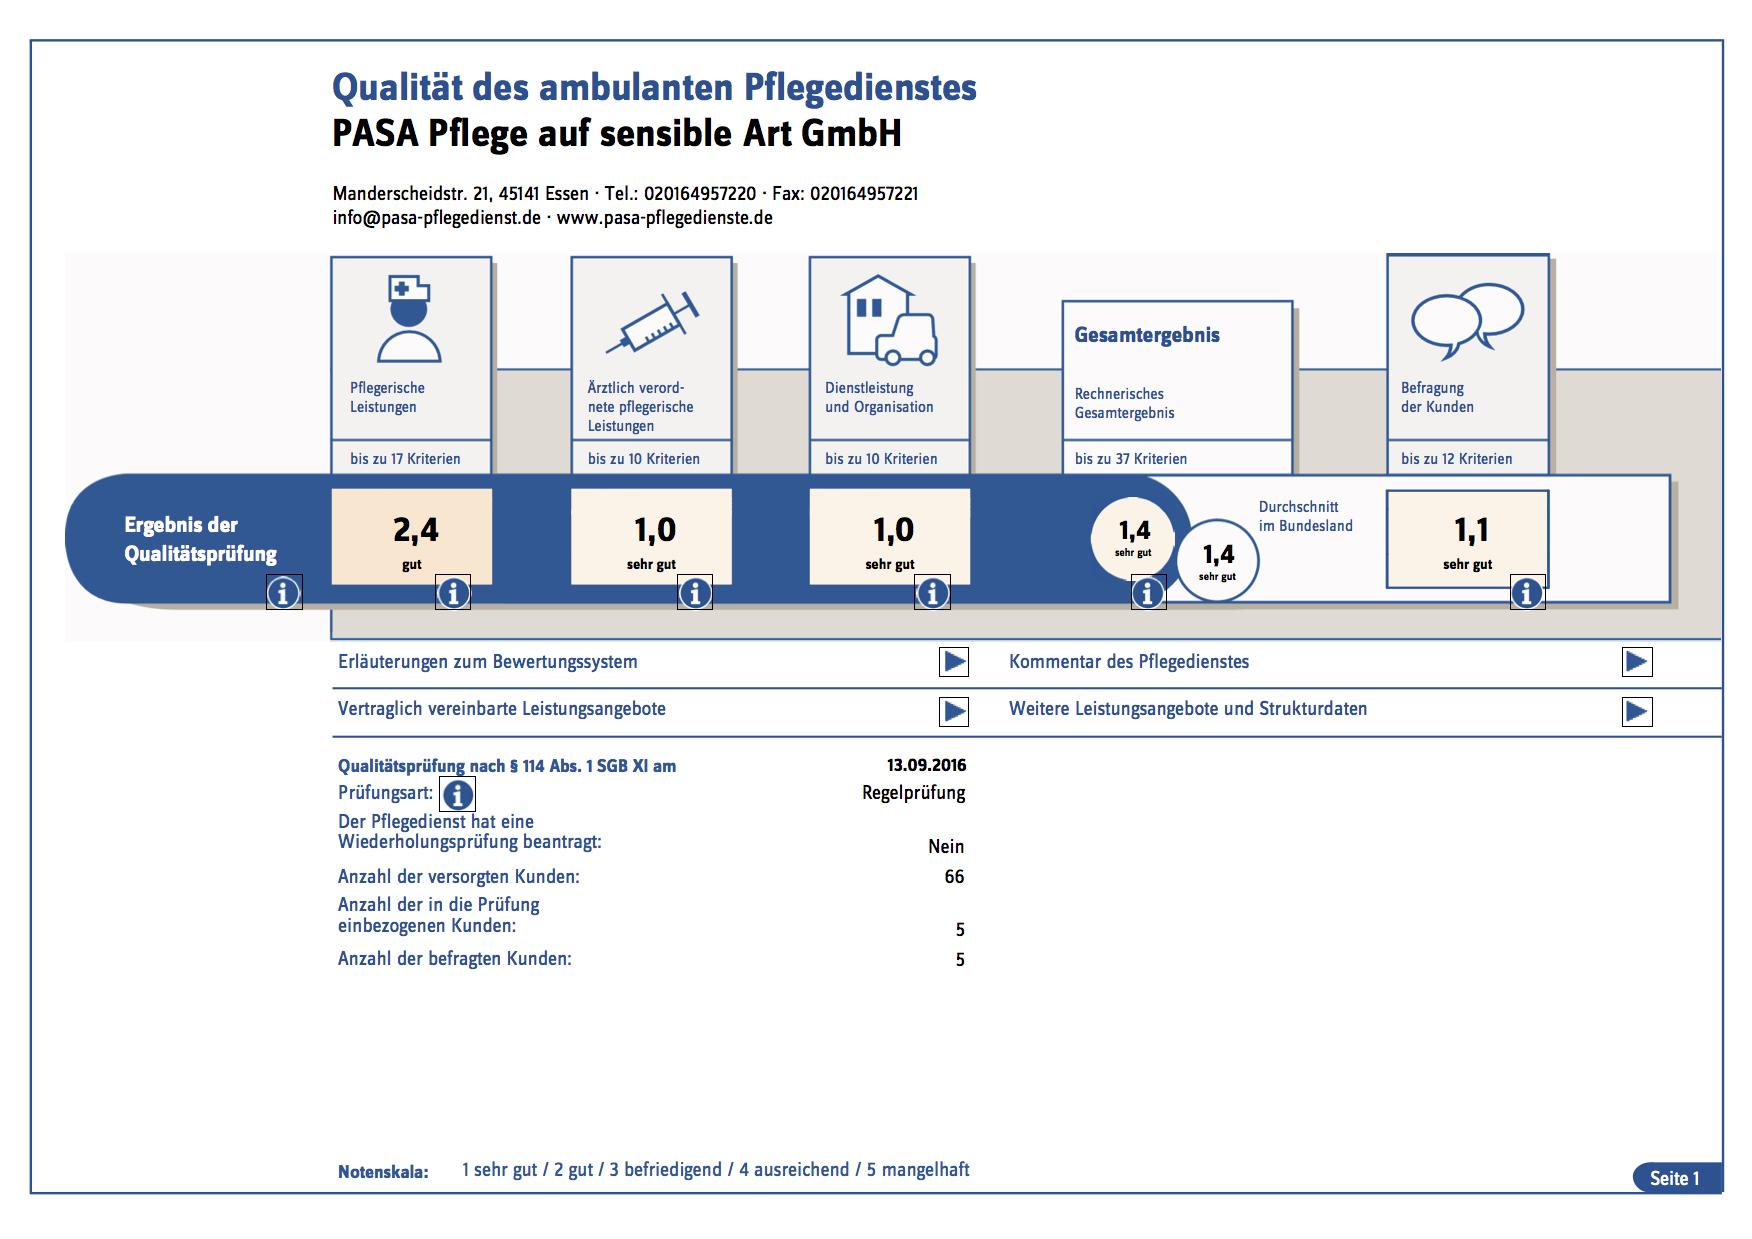 qualitaet-transparenzbericht-2016